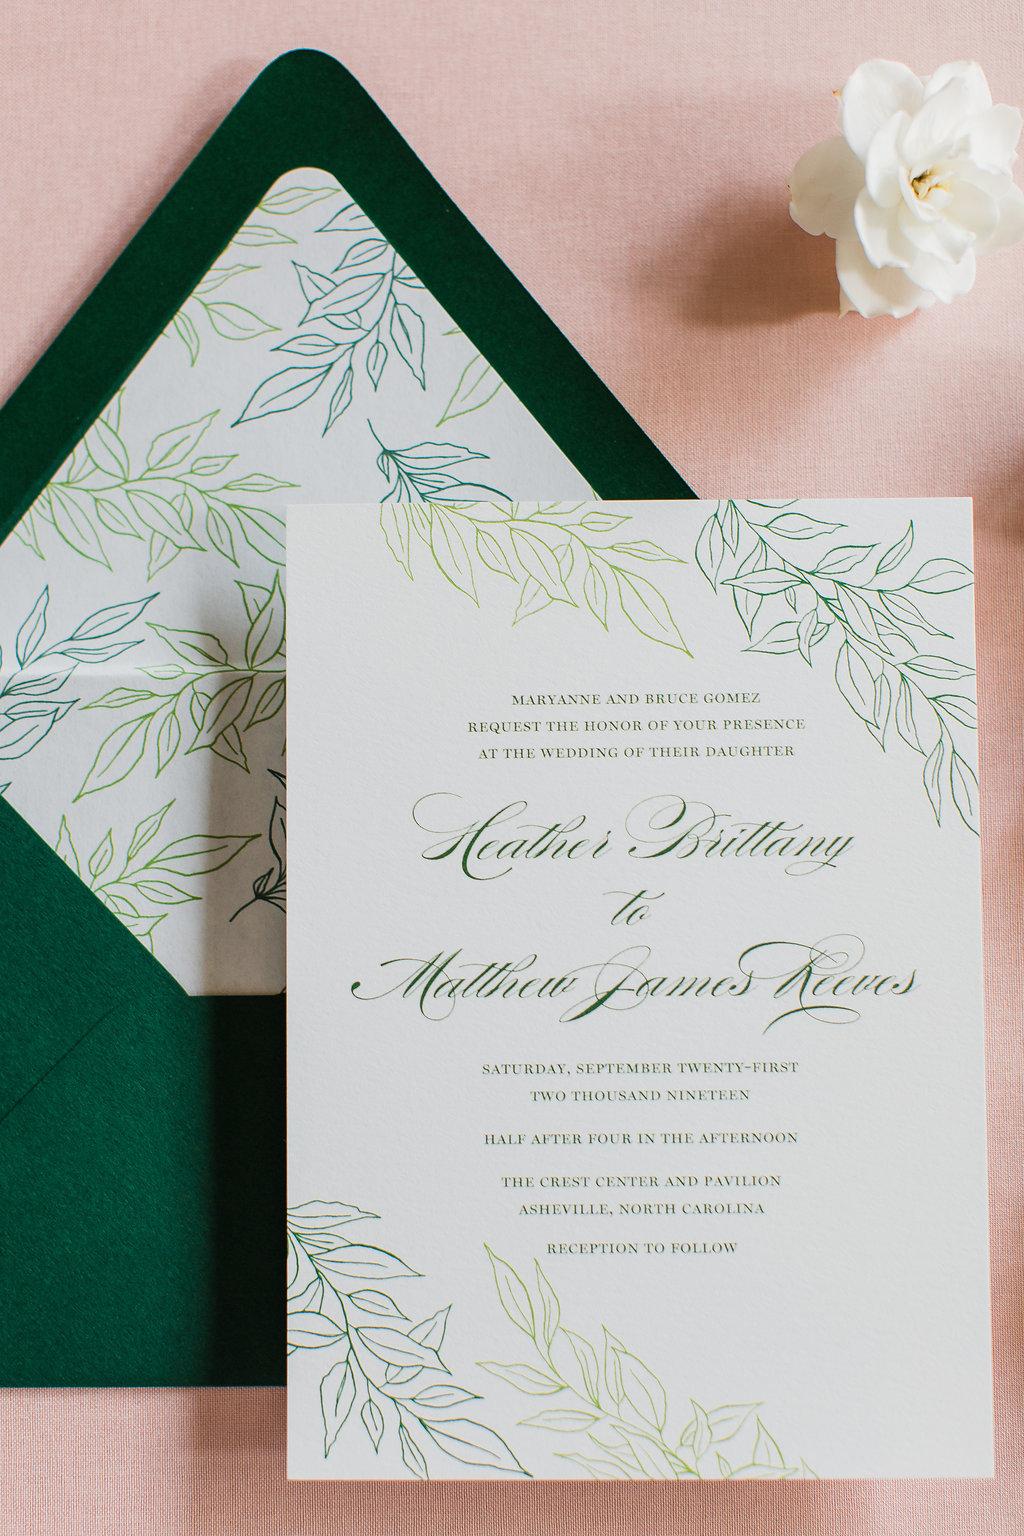 Heather Hand Drawn Wedding Invitation Greenery Feathered Heart PrintsFHP-37.jpg